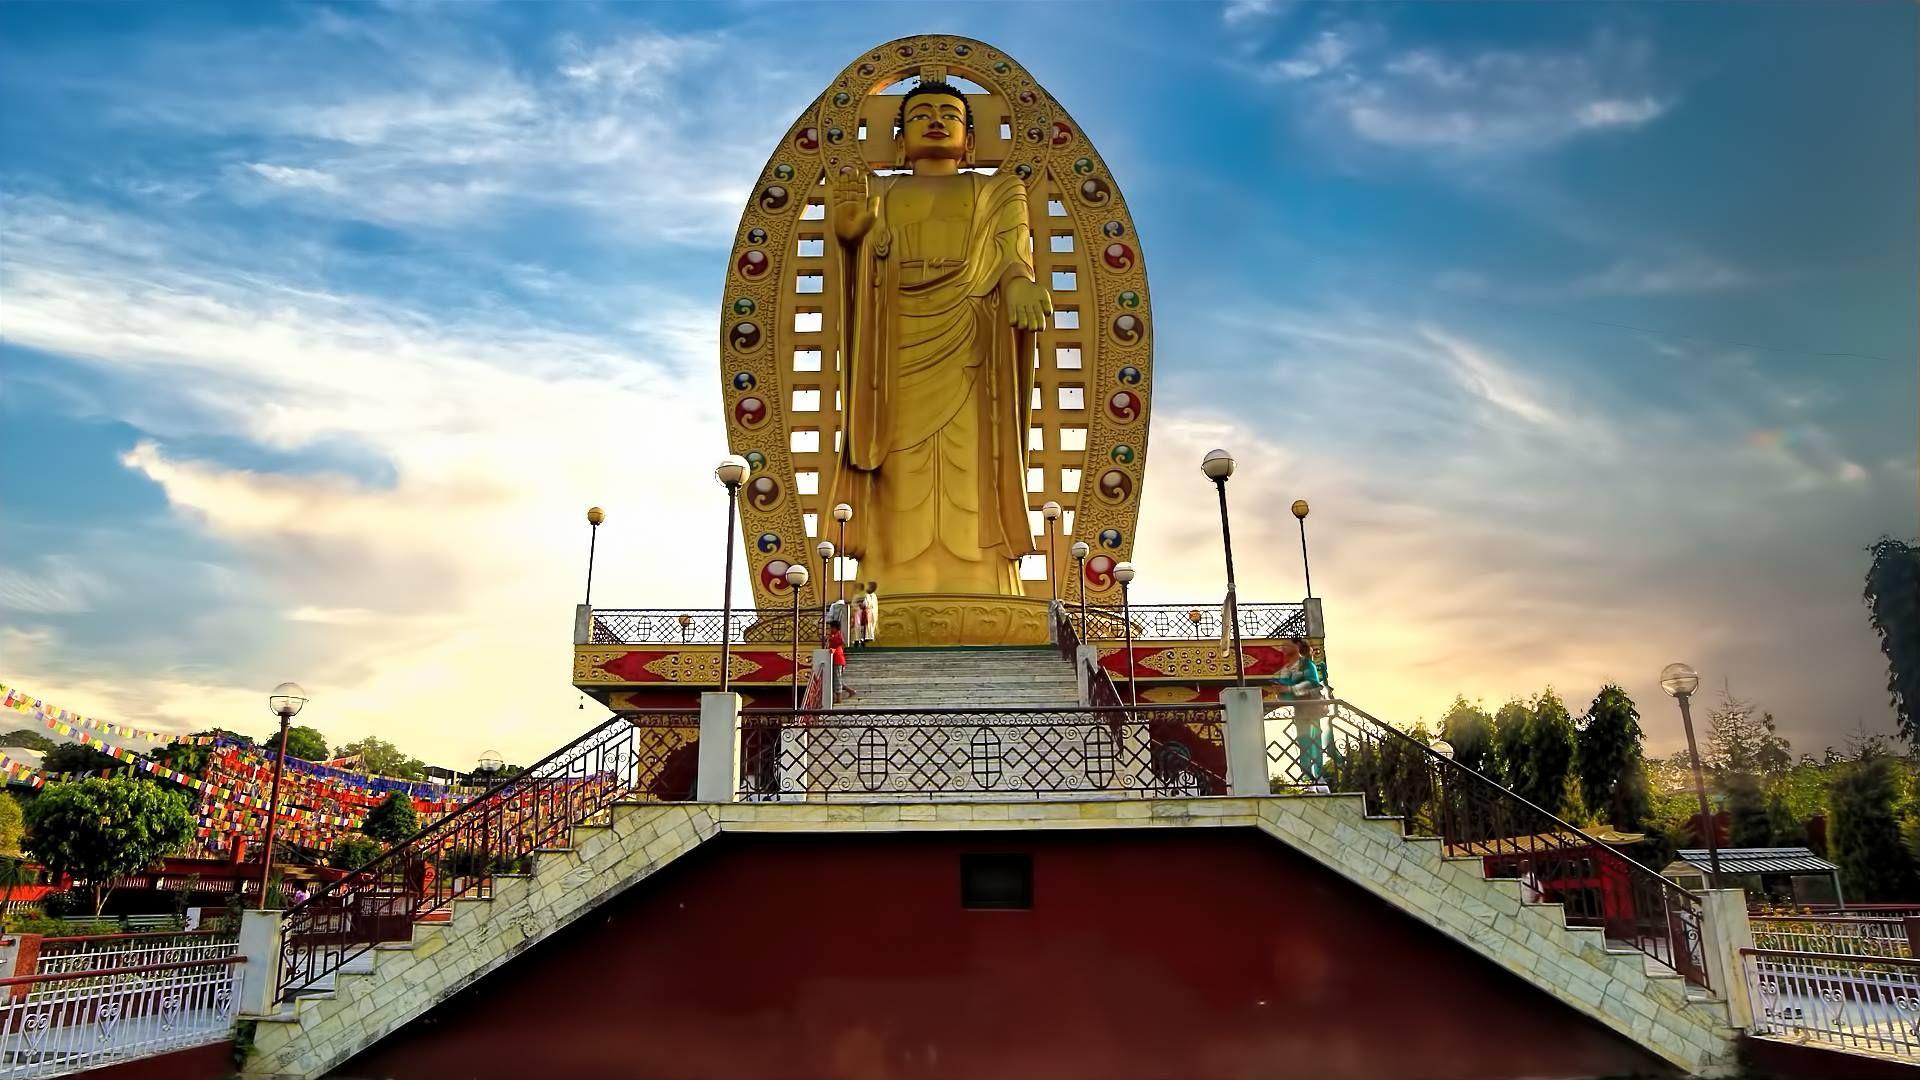 ITAP of Tibetan Buddhist Temple Dehradun (India) #photography via /r/itookapicture by tfpl_filmmaker